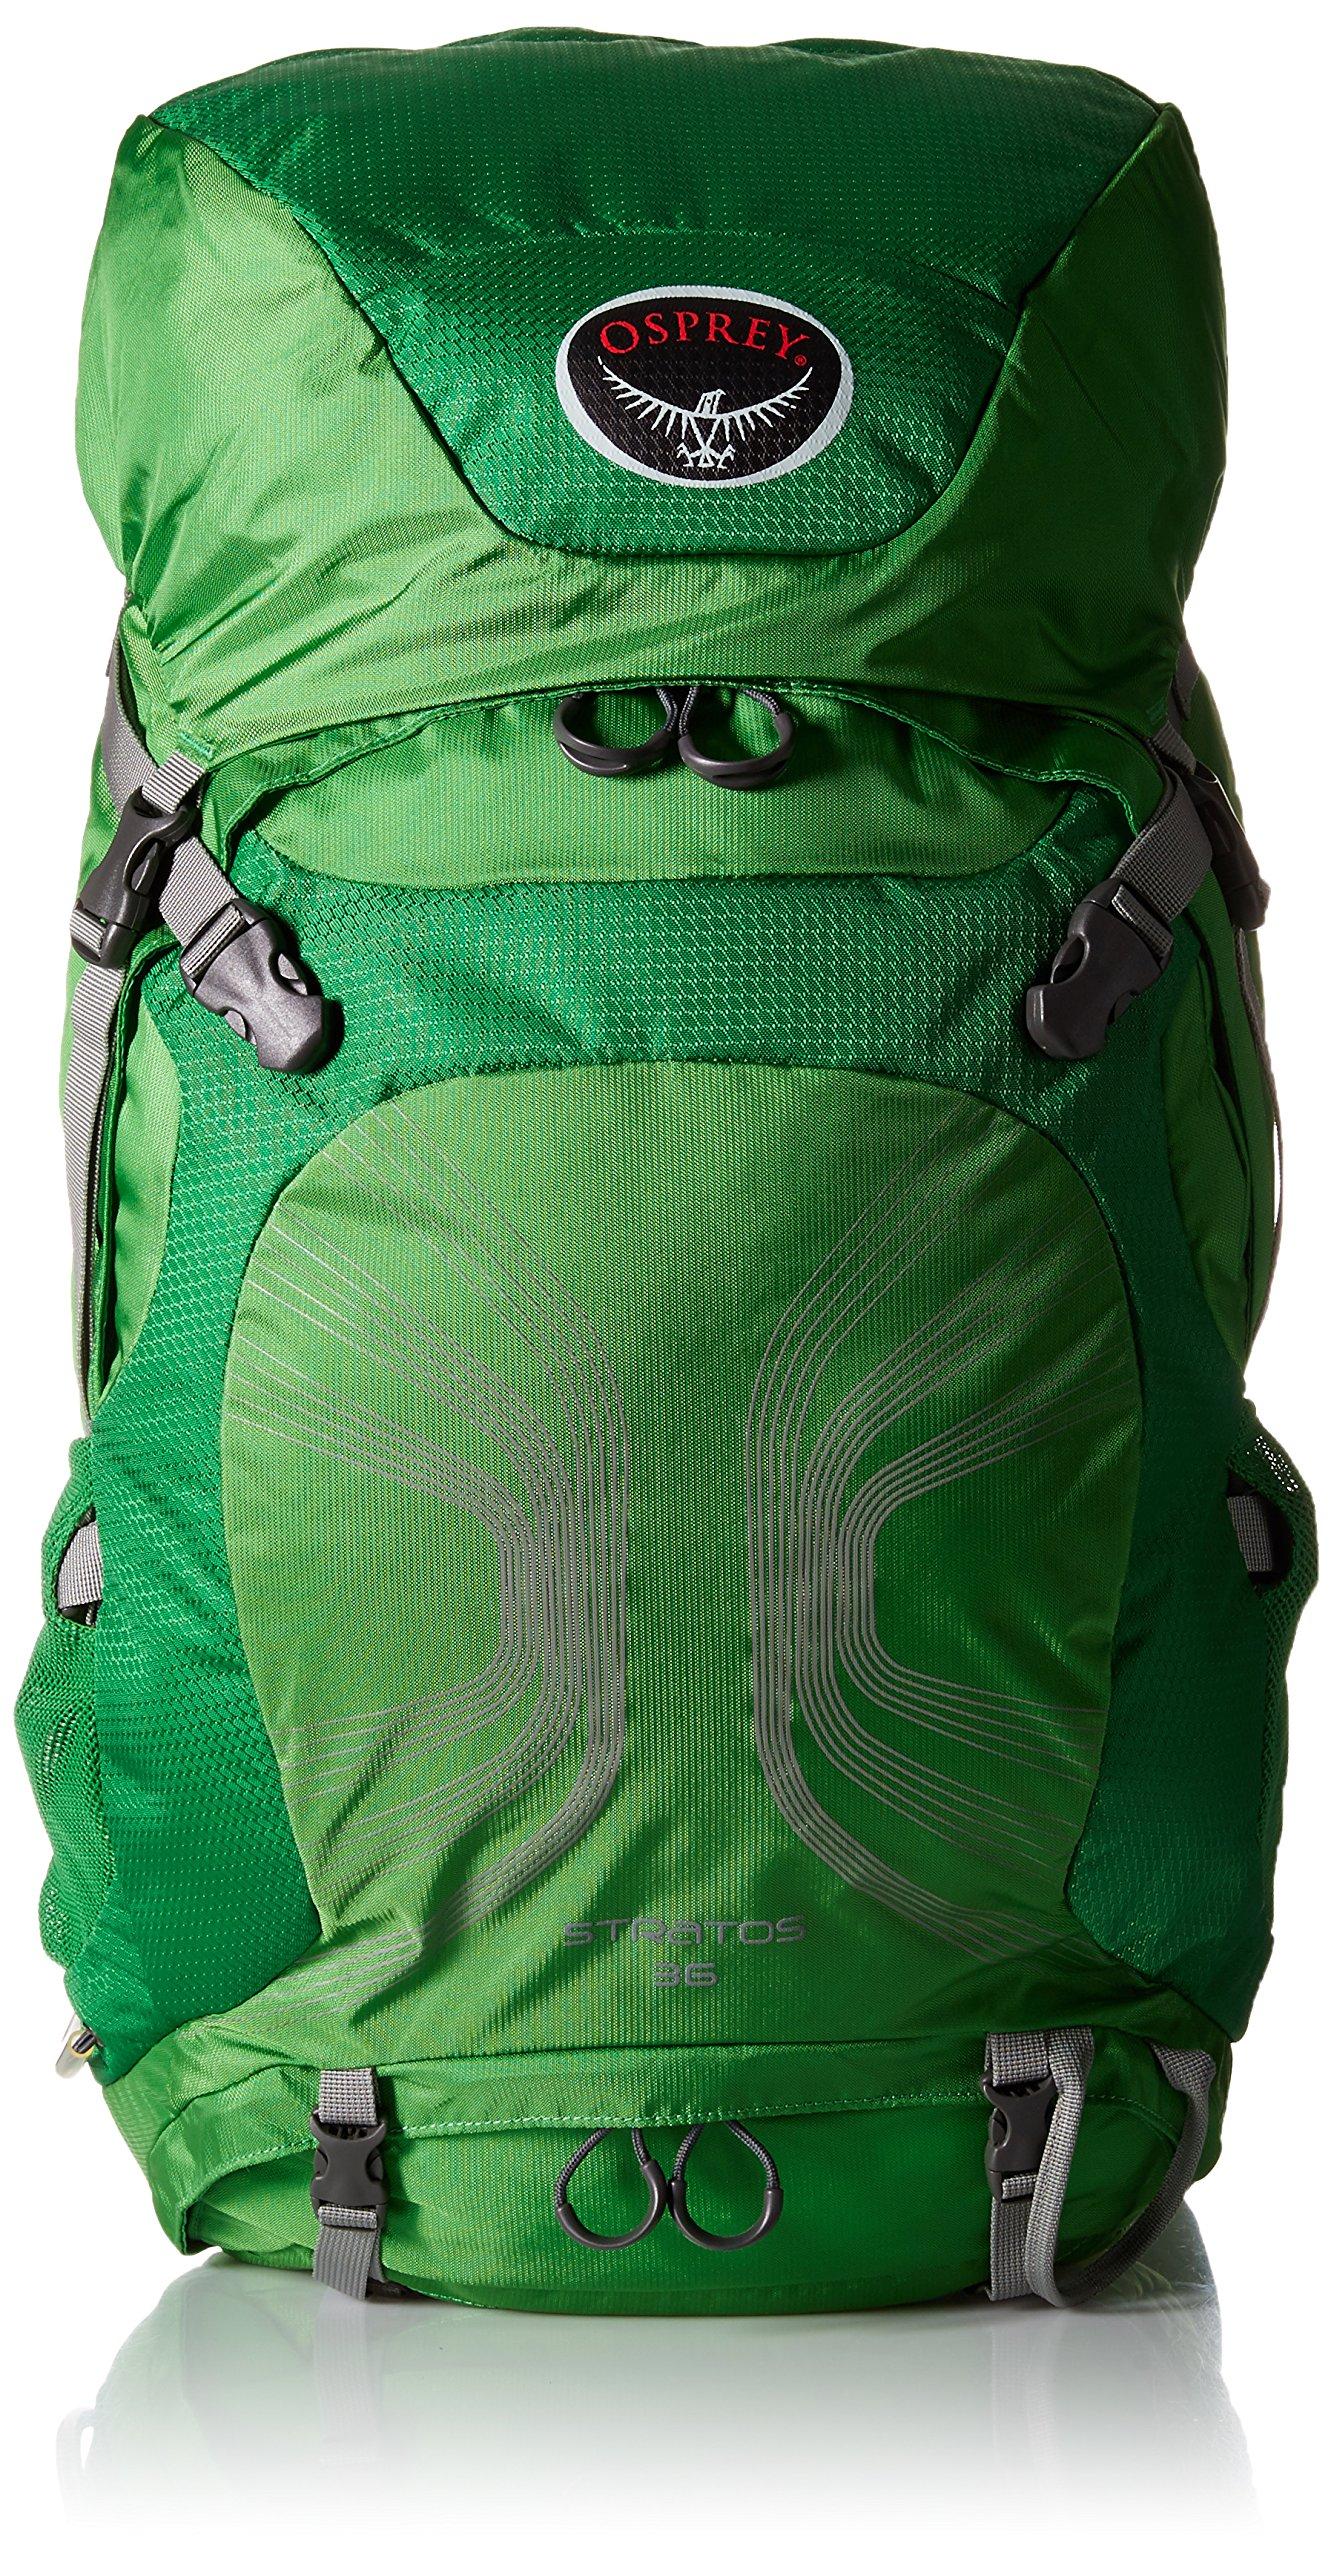 Osprey Packs Stratos 36 Backpack (2016 Model), Pine Green, Medium/Large